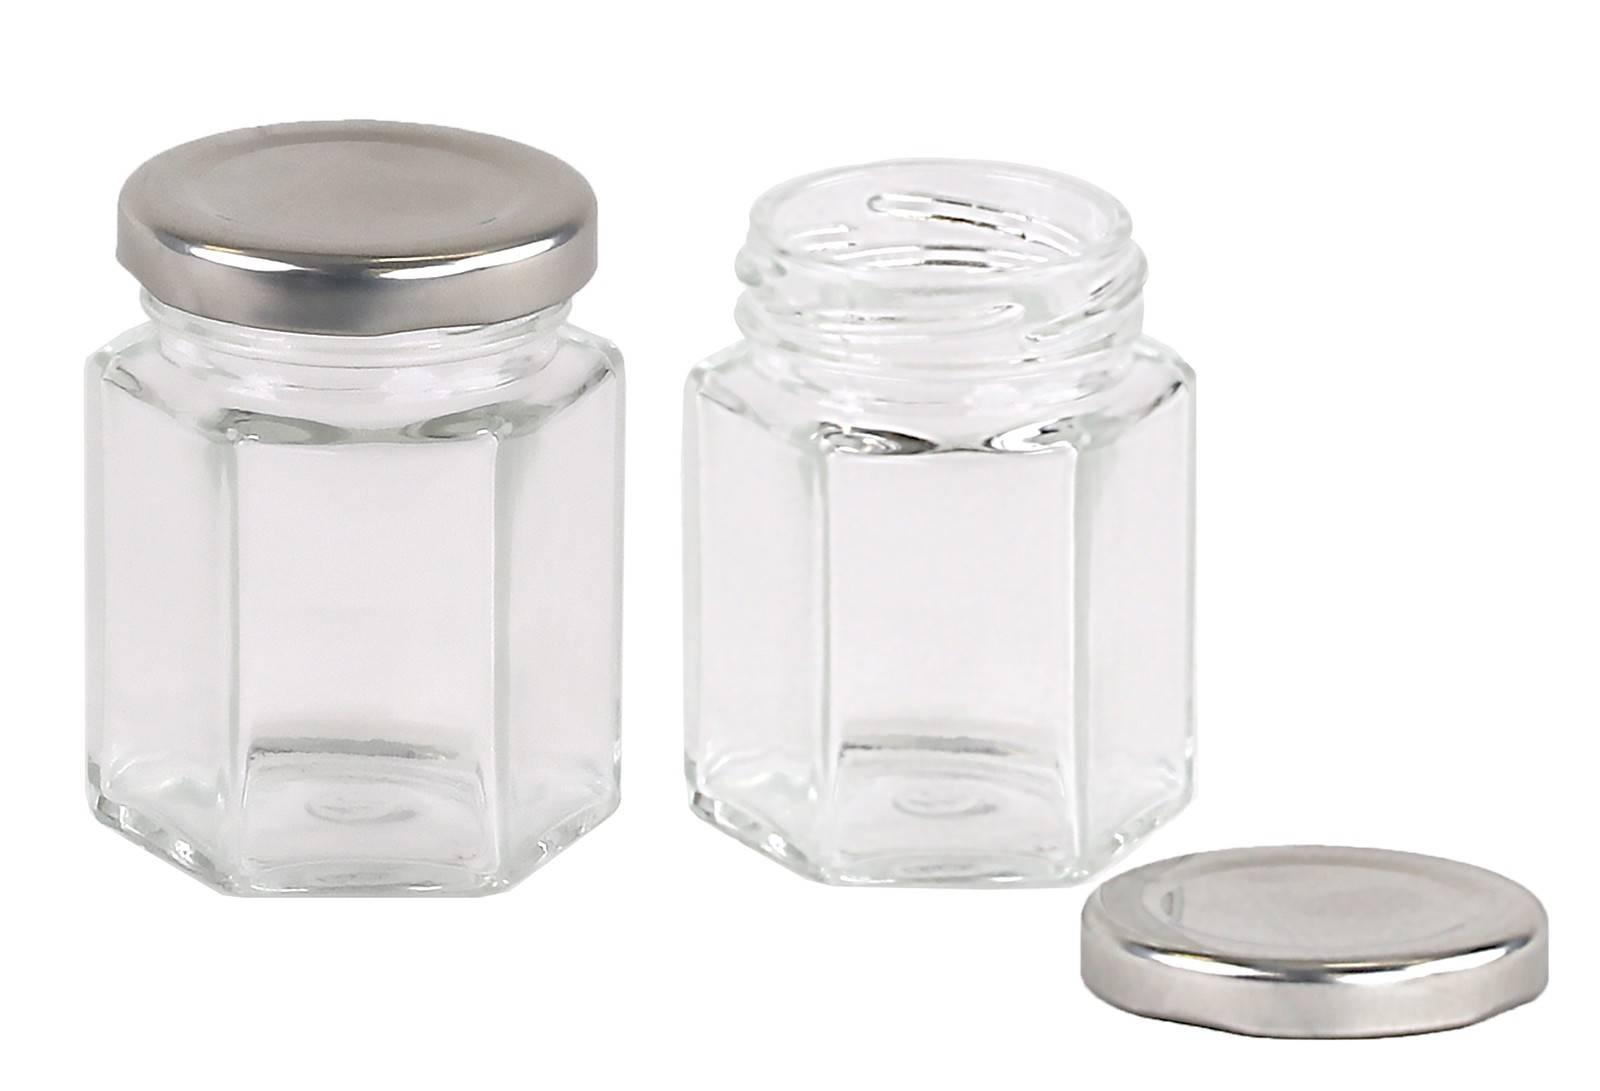 Carton 120 pcs Honey Jars - 60gm size - Glass Hexagonal with Silver Lid